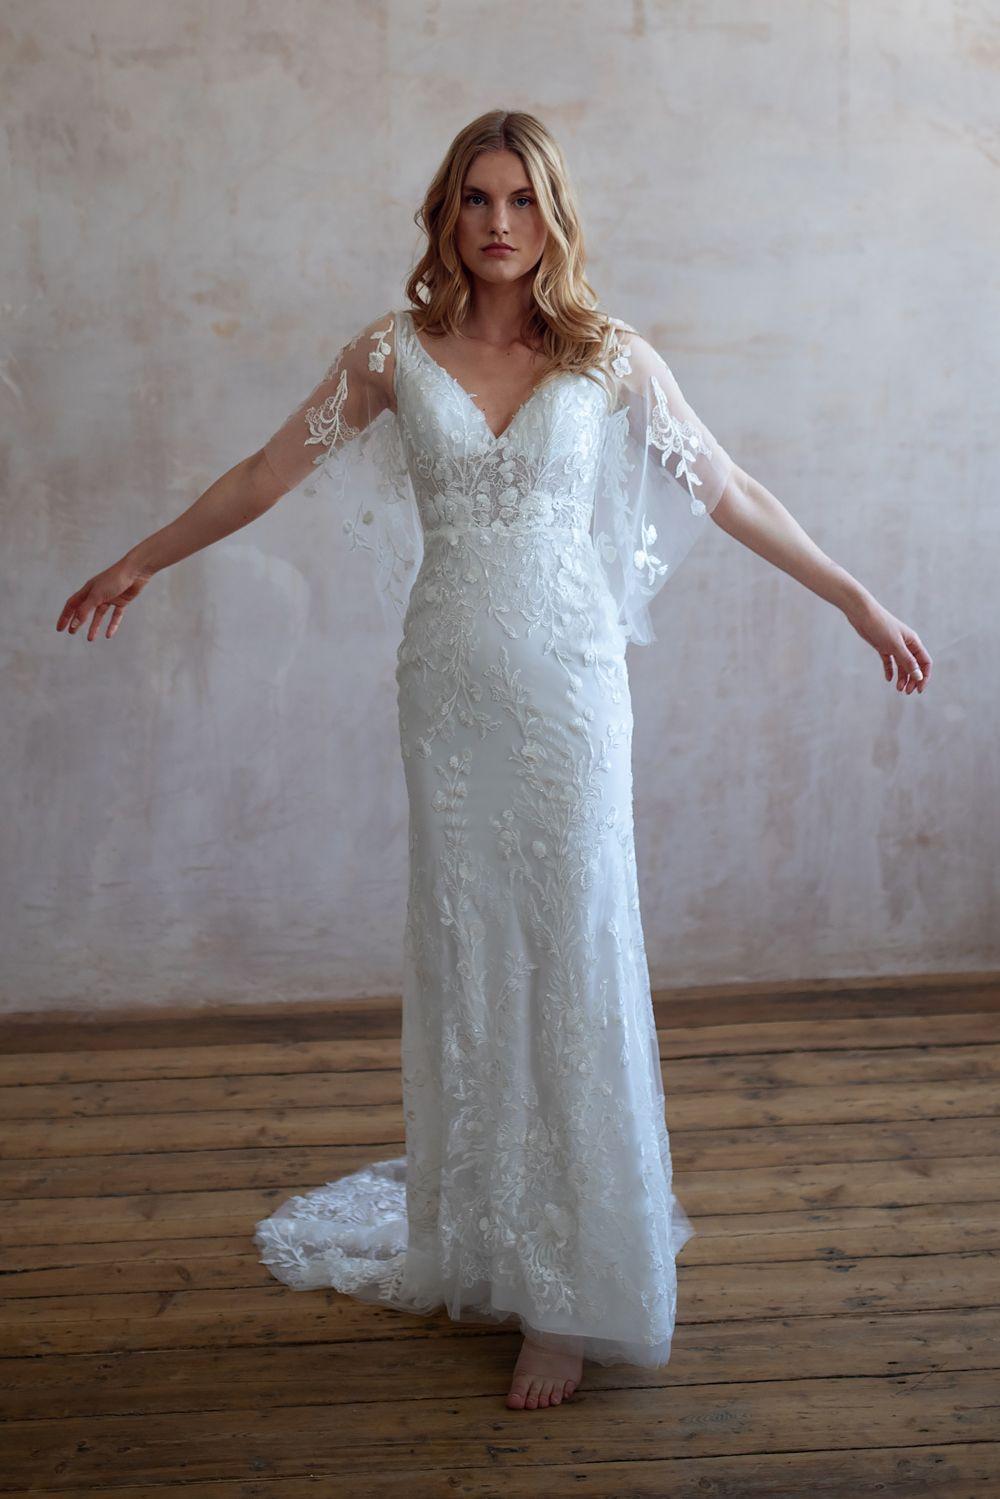 Wedding Dresses Lace Lace Wedding Dresses Wedding Dress Lace Lace Wedding Dress Wedding Dresses Bridal Shops Near Me Bridal Shops London 6 3